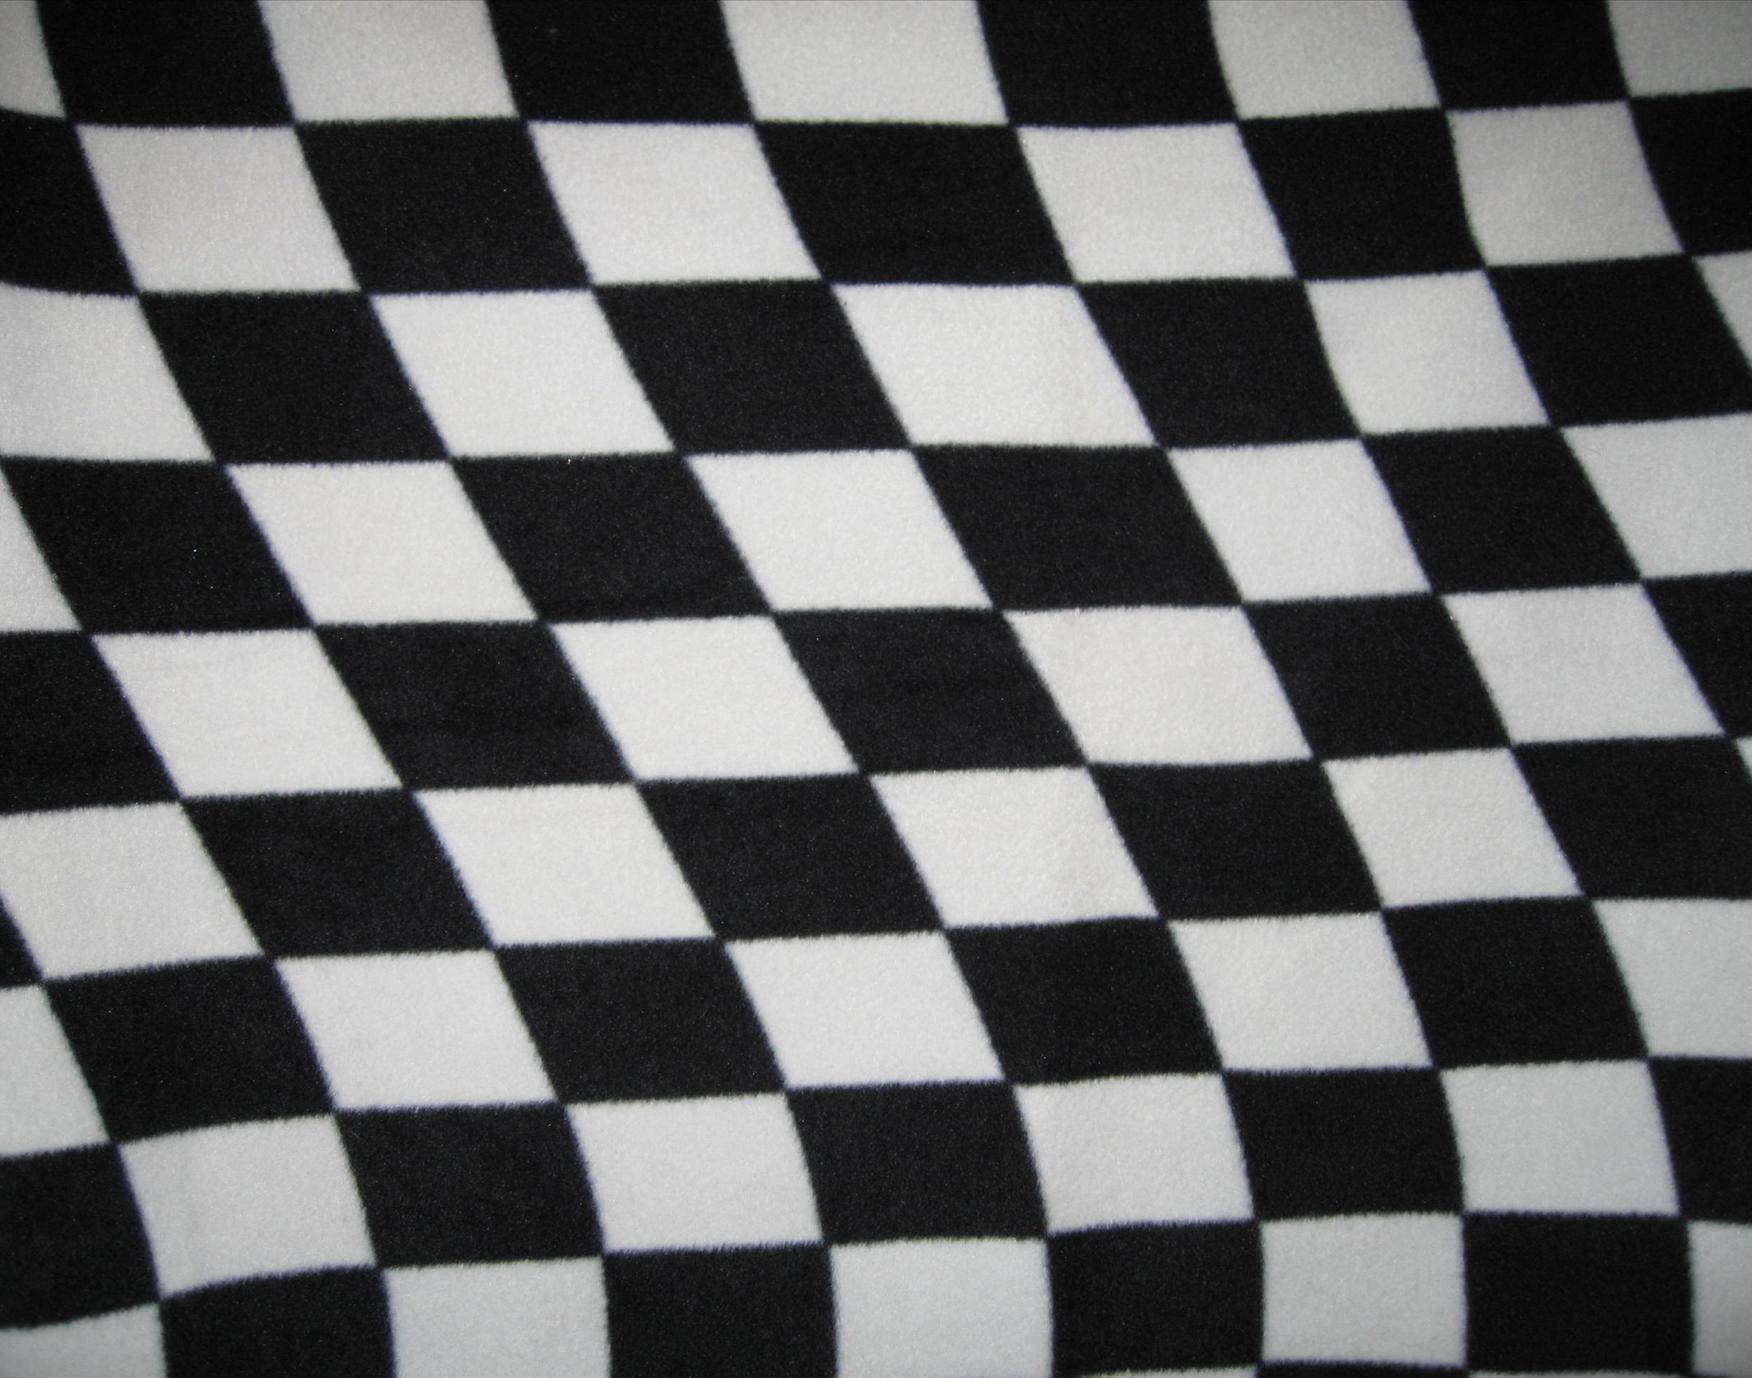 Checkered Flag Background Checkered flag background 1752x1378